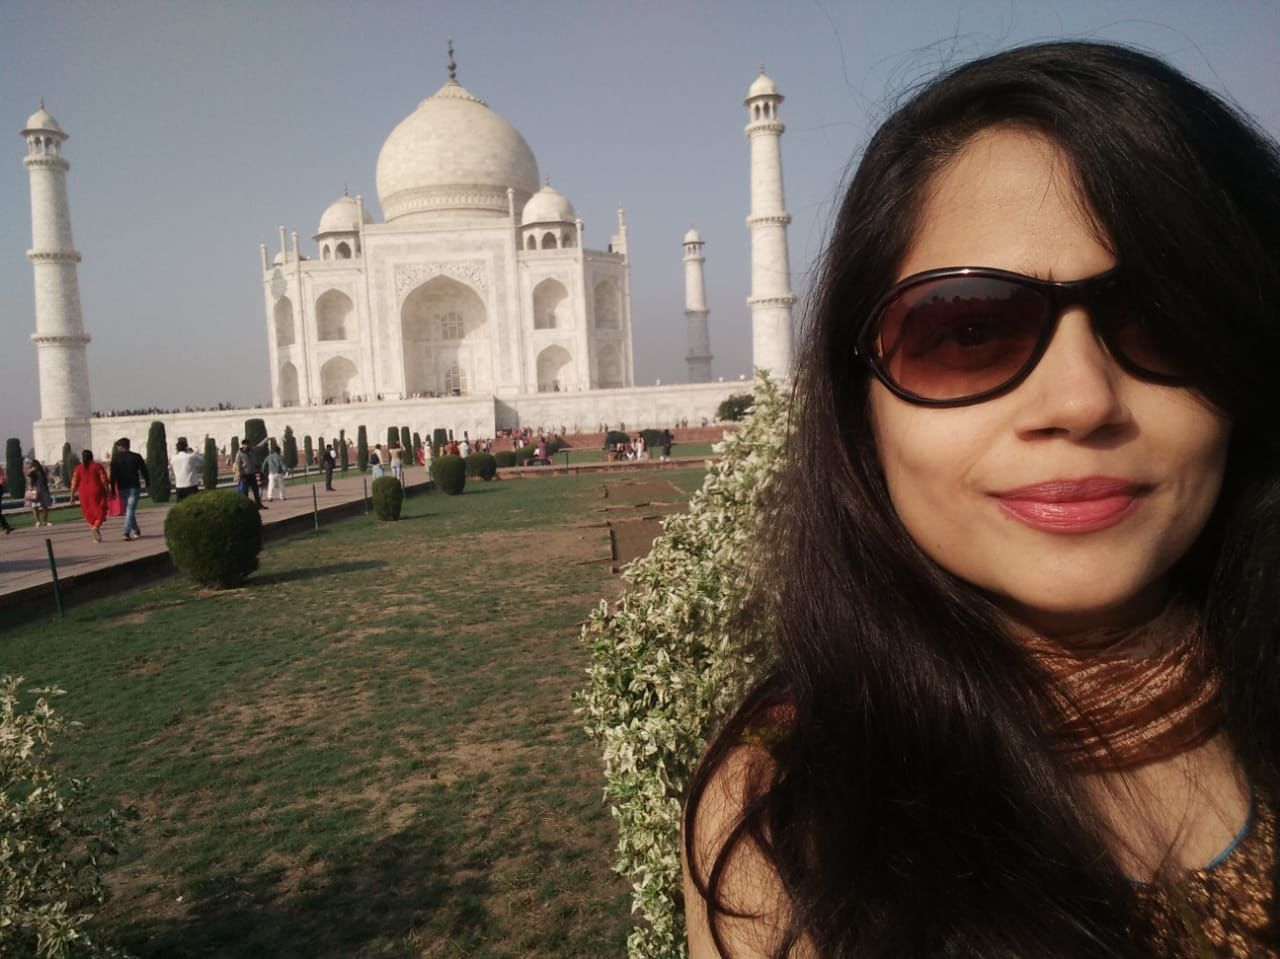 Photo of Taj Mahal By Erika